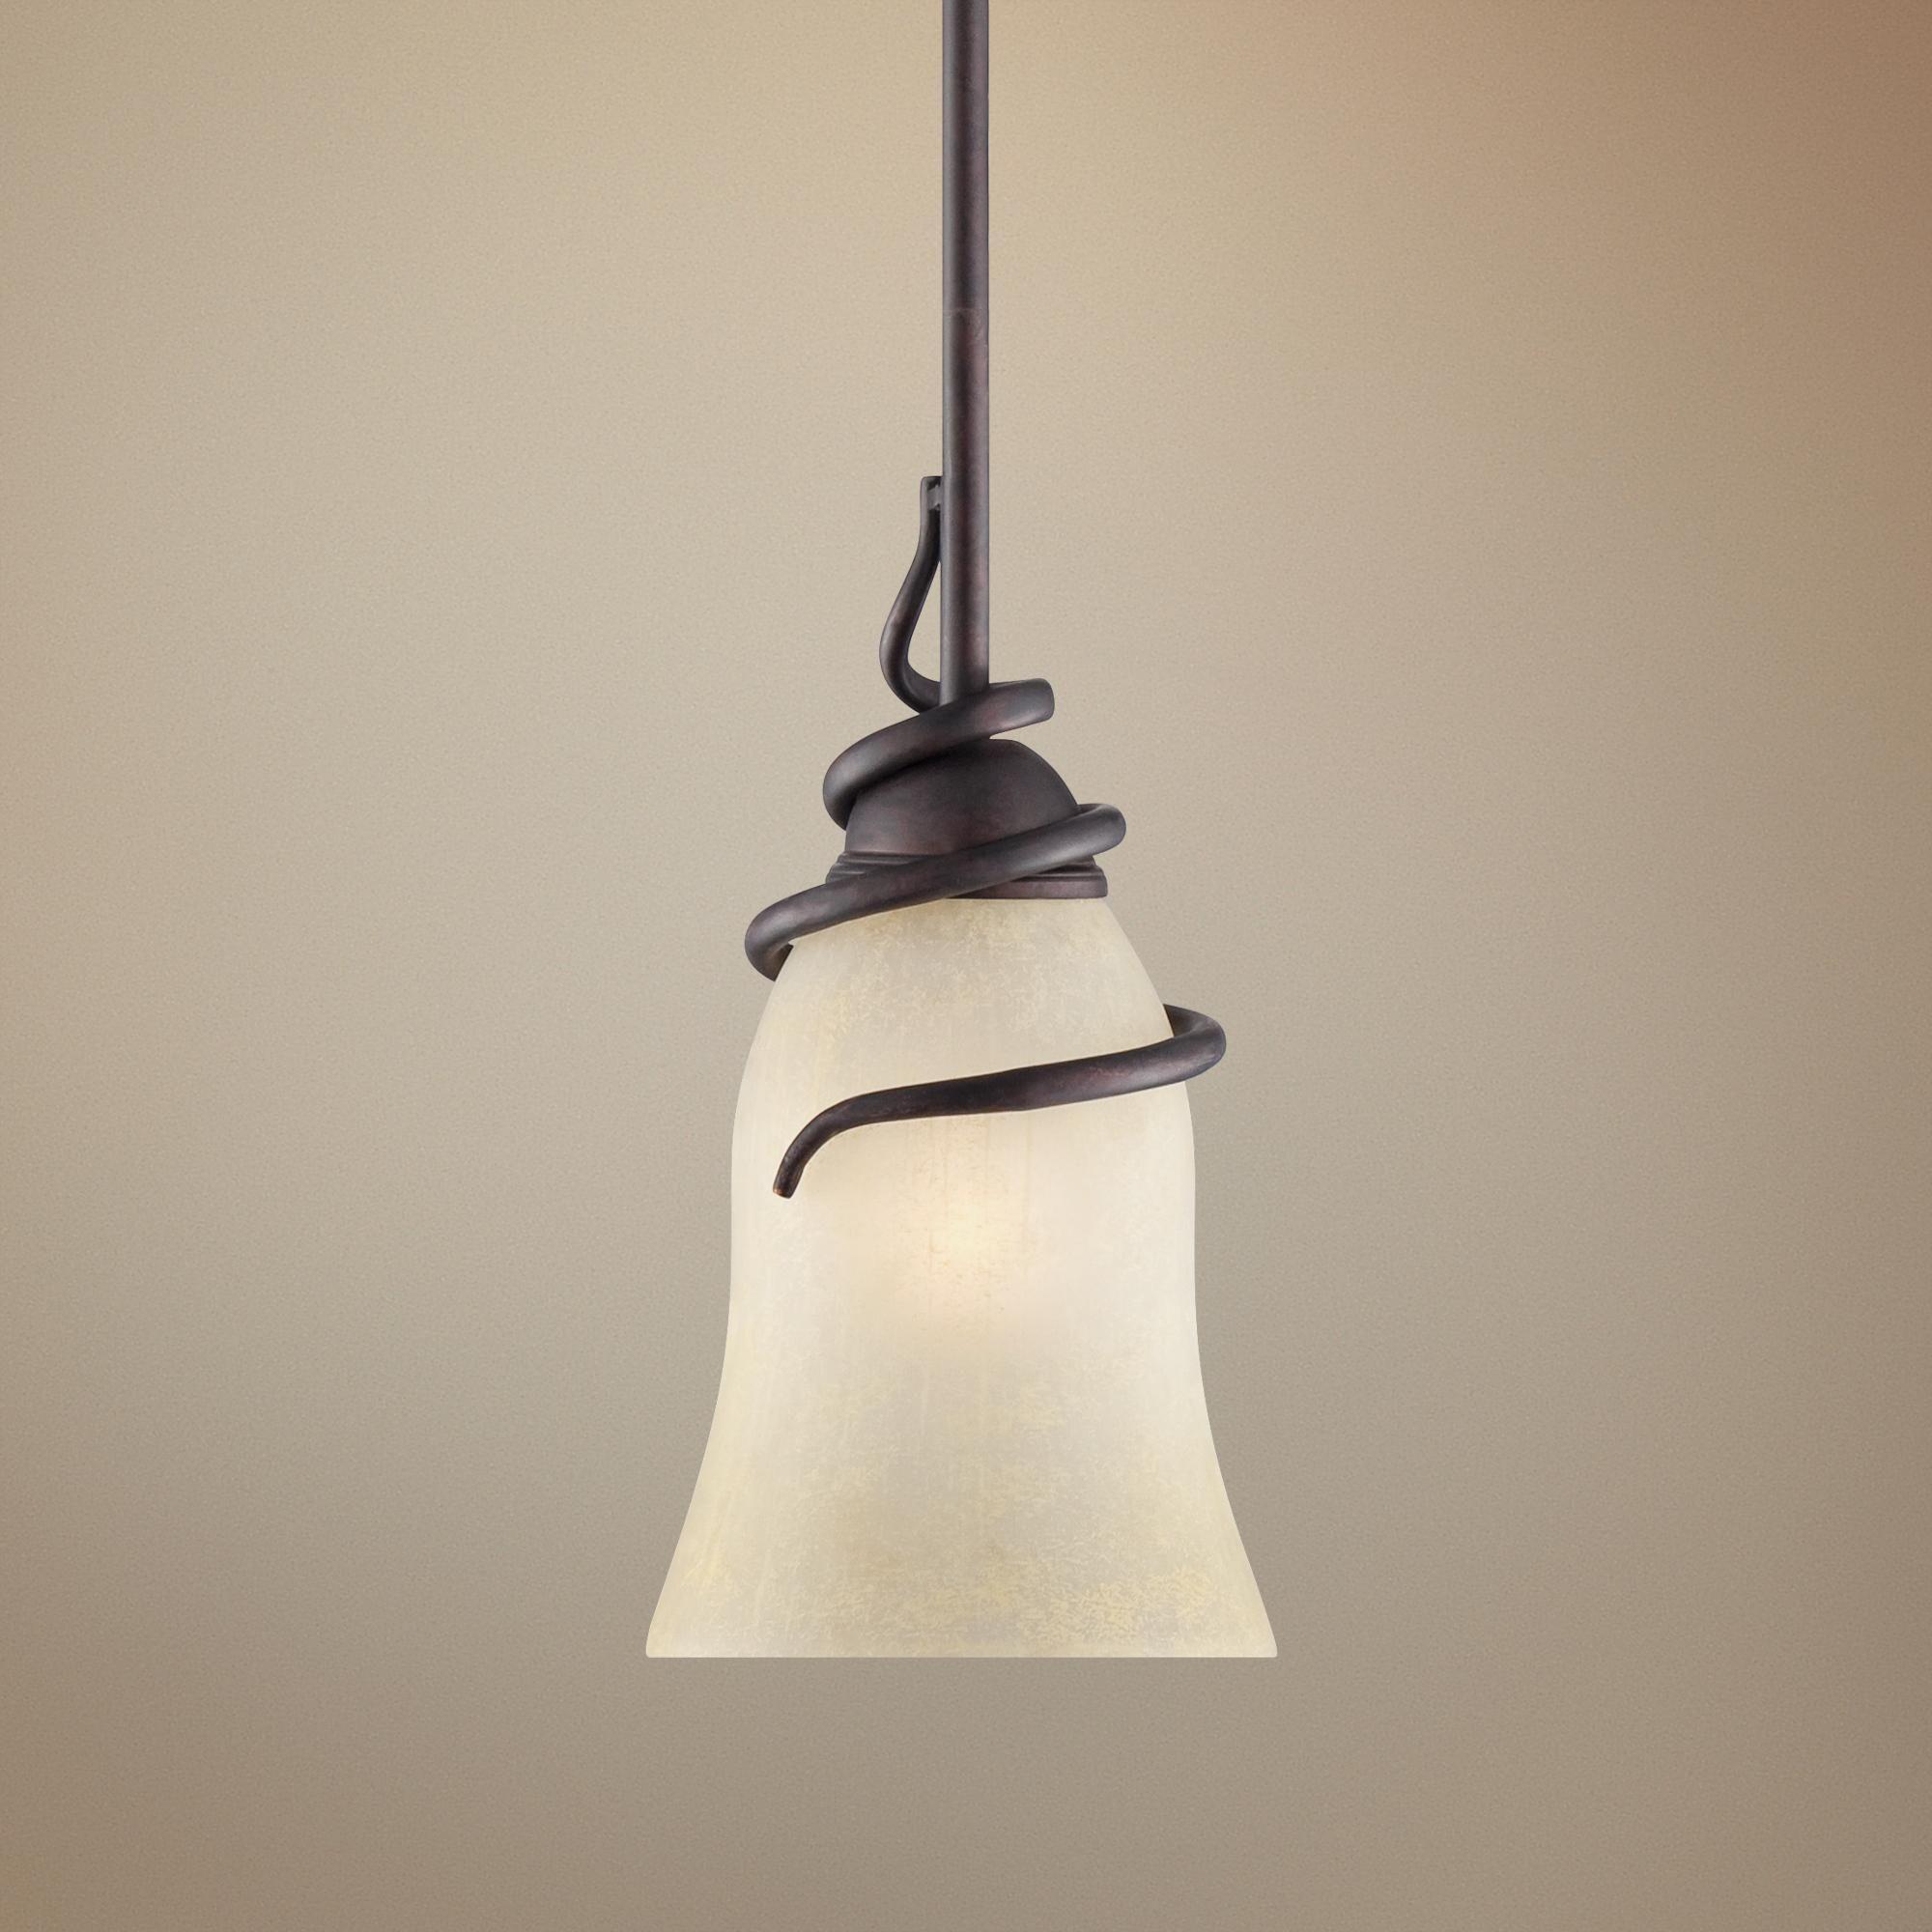 "Swirled Iron 12"" High Bronze Mini Pendant Light"